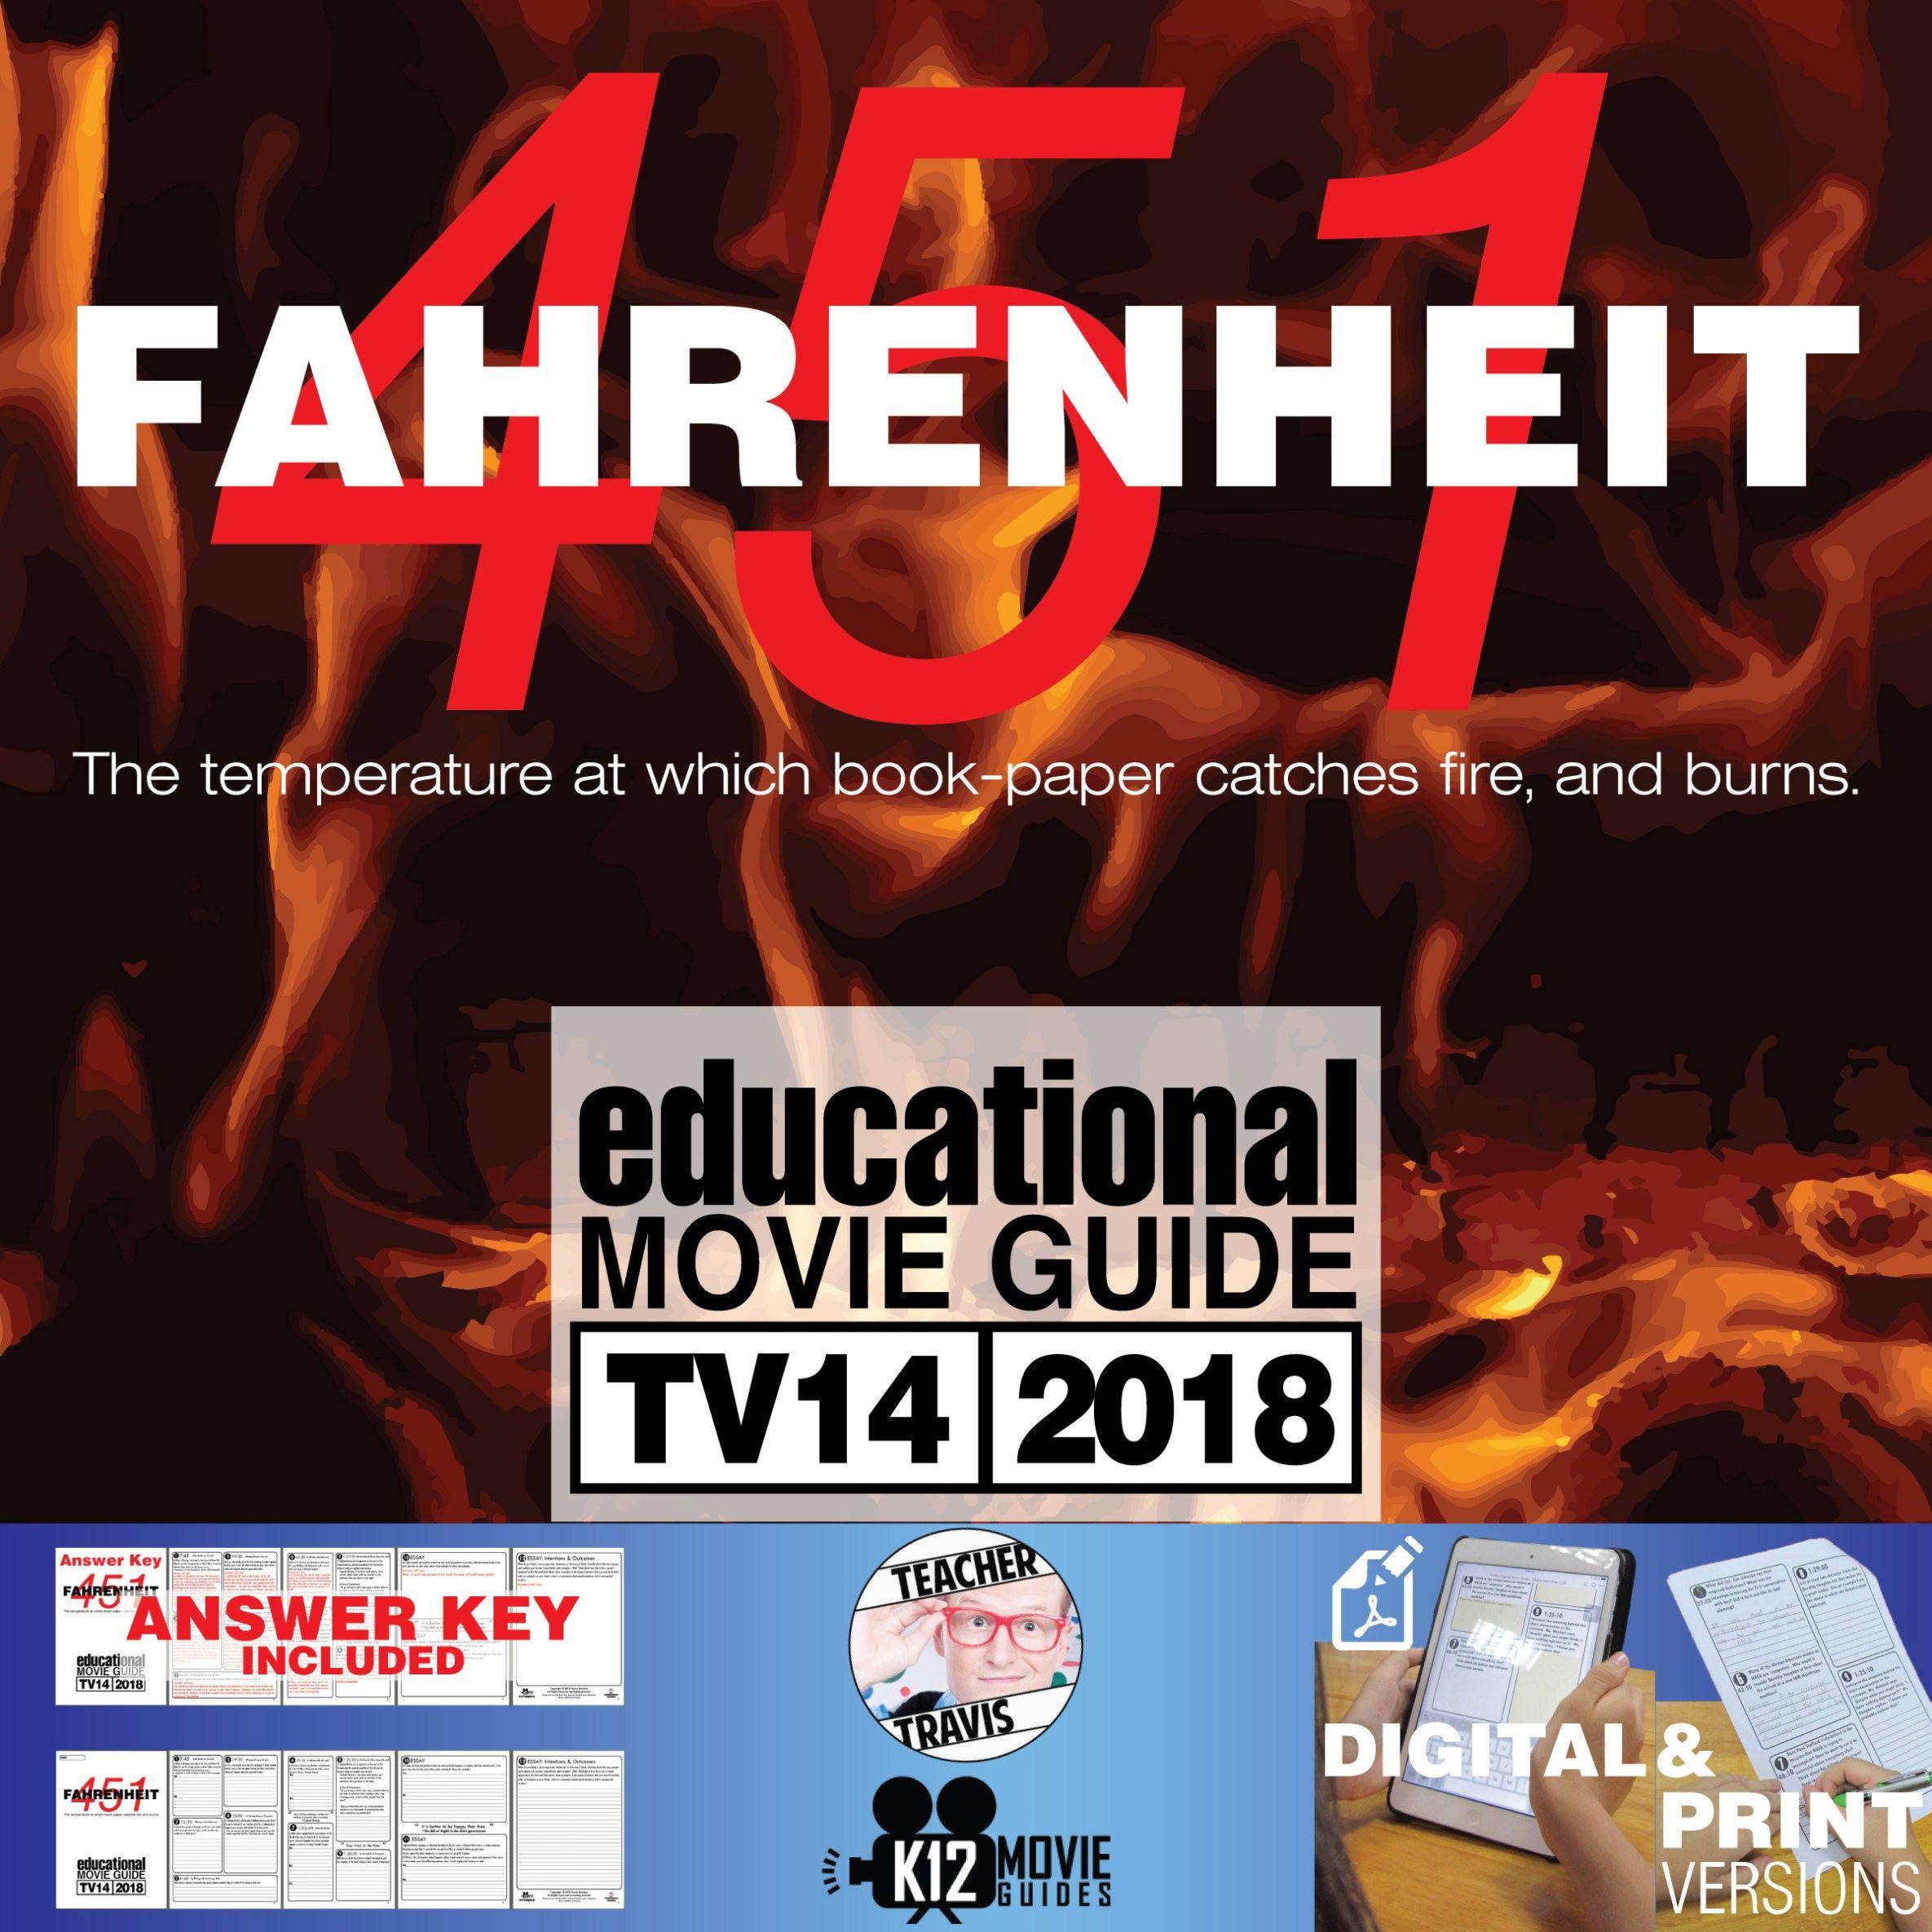 Fahrenheit 451 Movie Guide